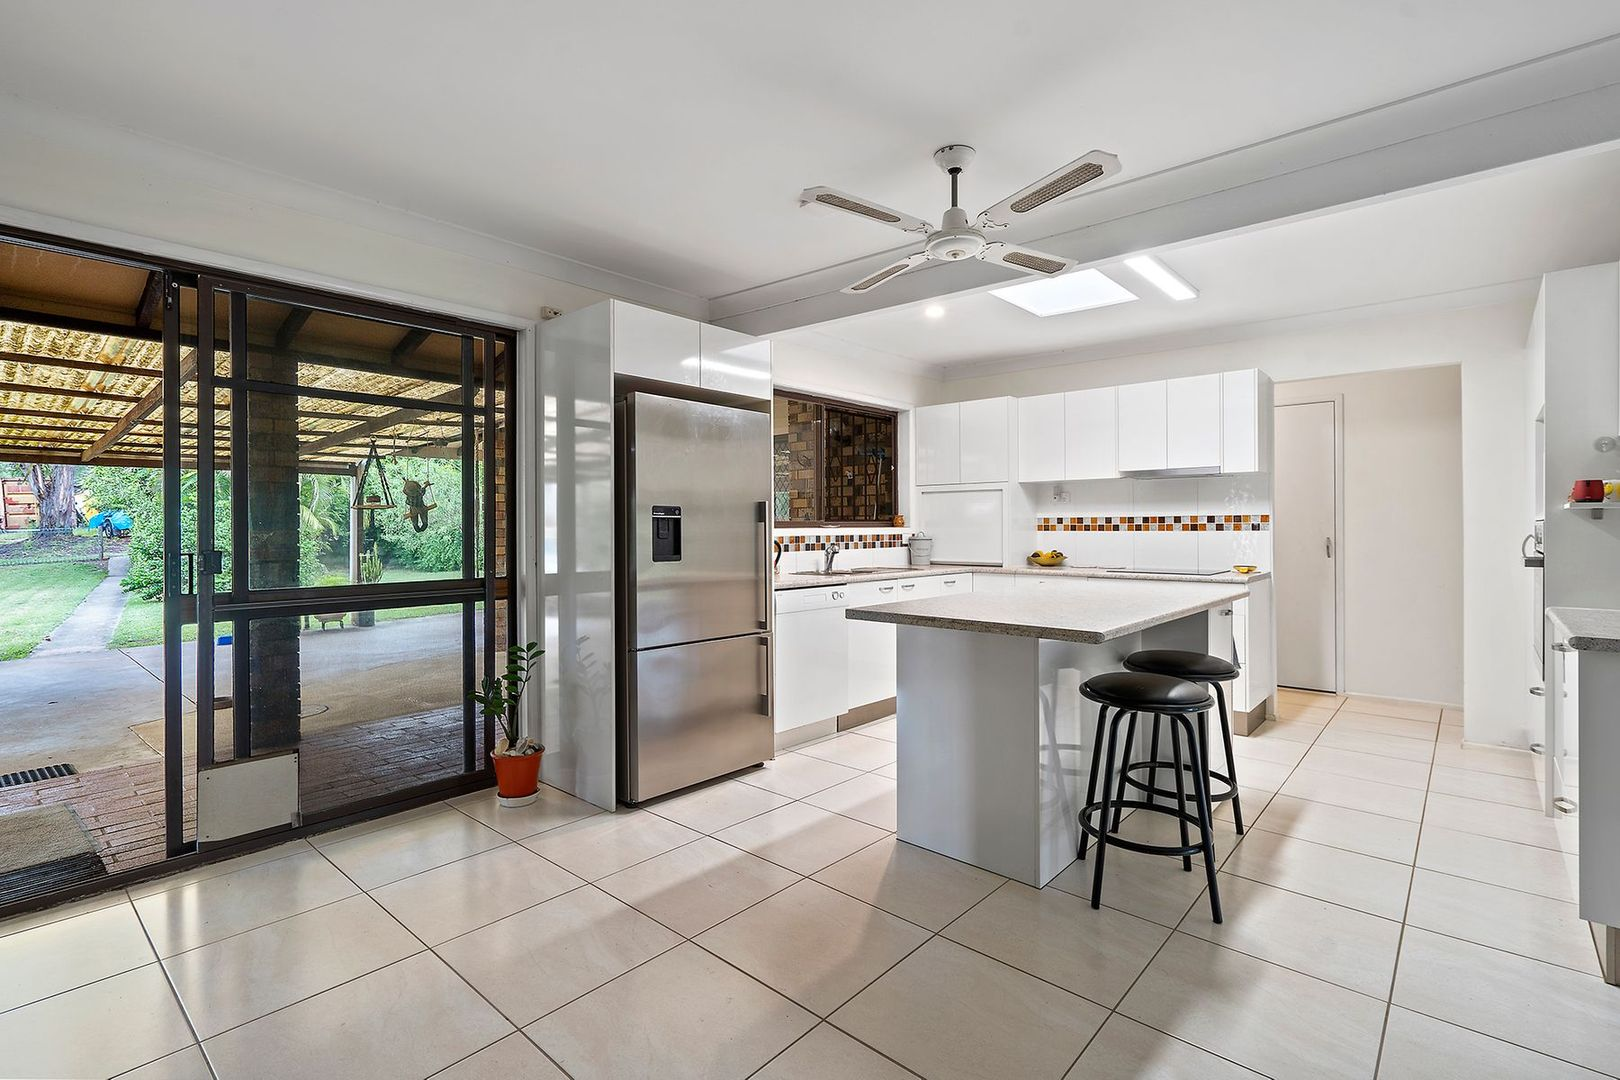 82-88 Sharton Avenue, Buccan QLD 4207, Image 2